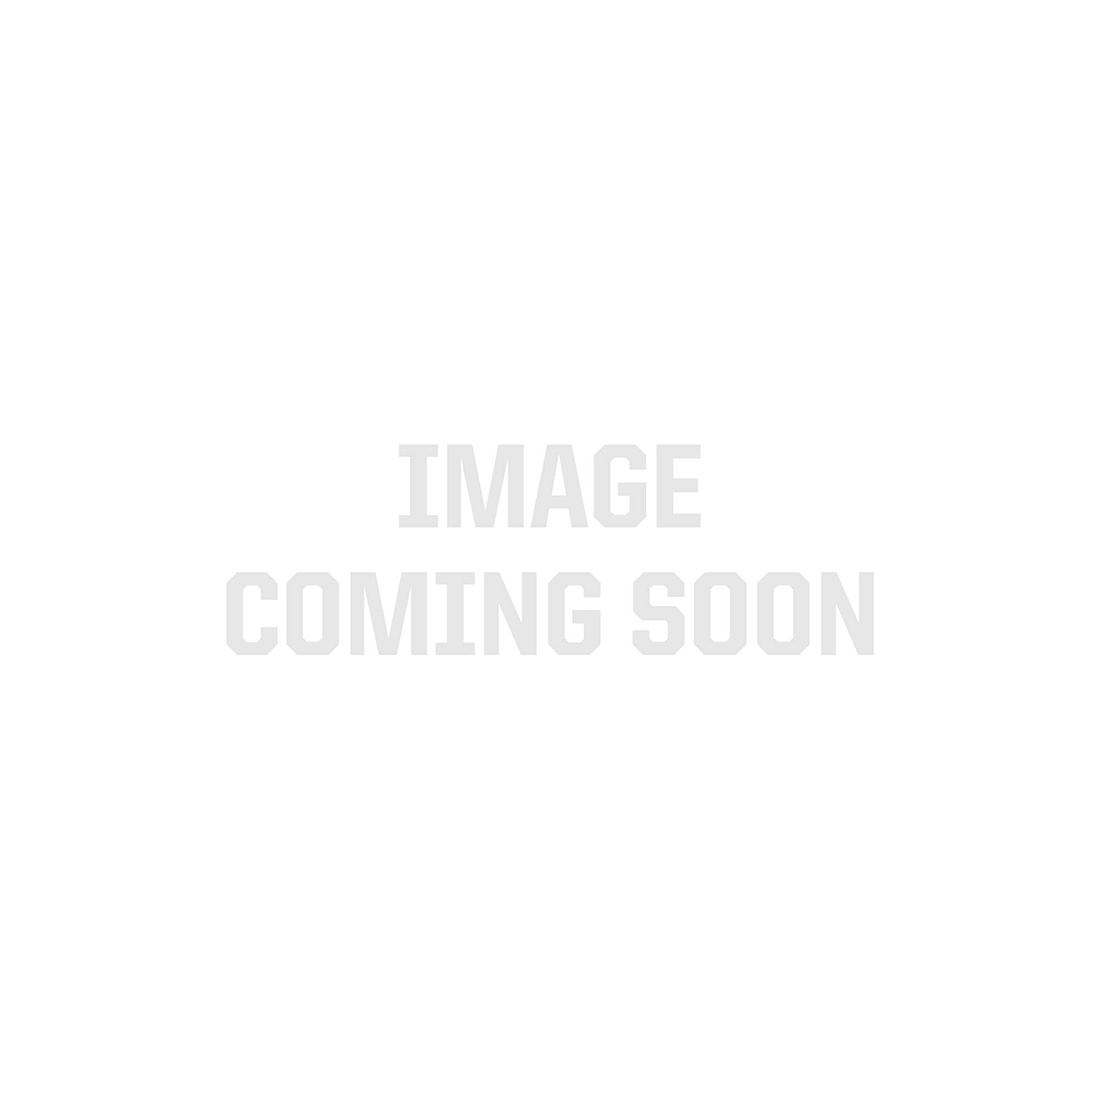 MaxLite 2x4 Direct Lit LED Flat Panel Economical Series, 47 Watts